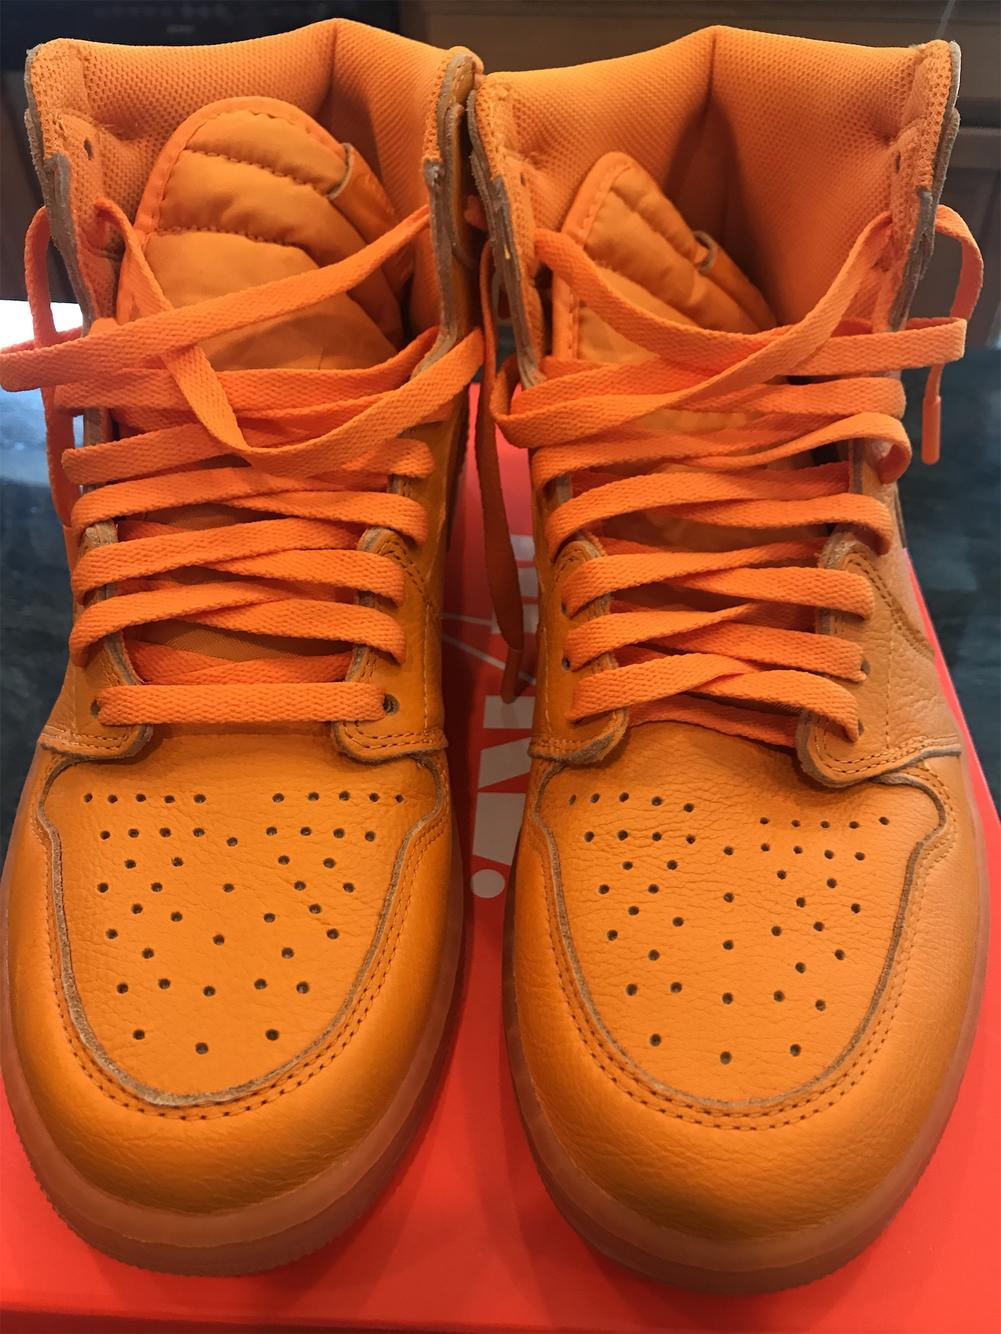 Orange Men's Size Men's 10.5 (W 11.5) Air Jordan Shoes | SidelineSwap